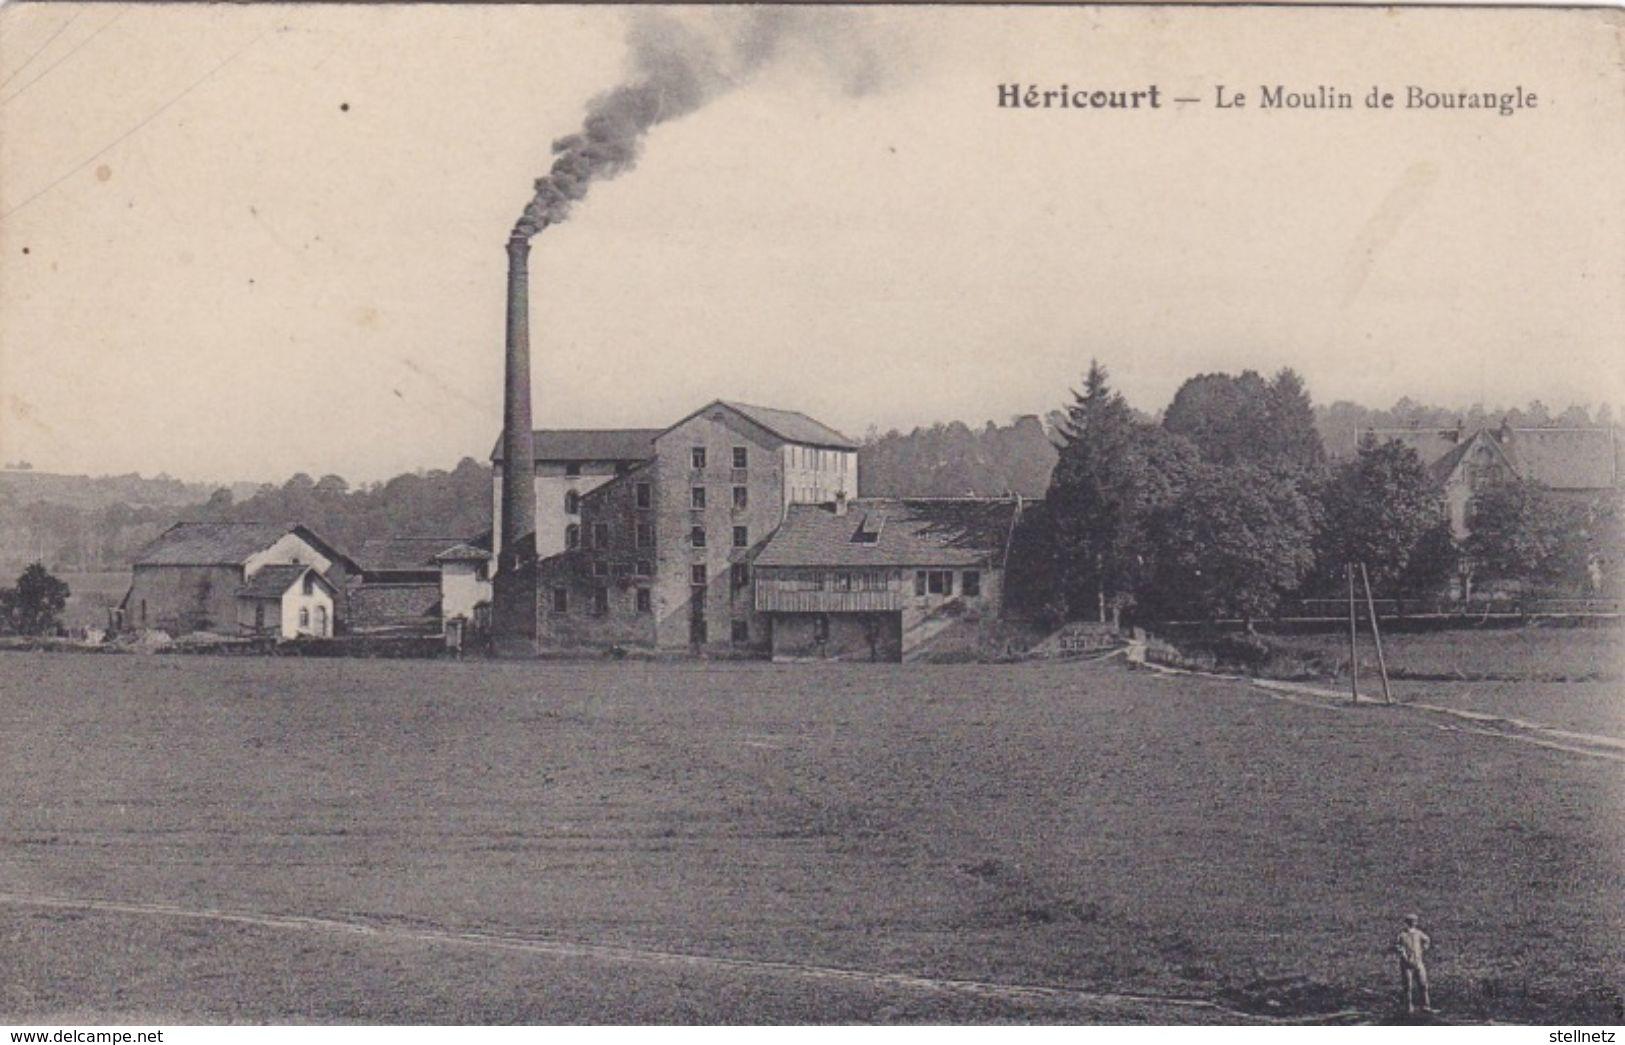 Alte Ansichtskarte Aus Héricourt -Le Moulin De Bourangle- - Otros Municipios